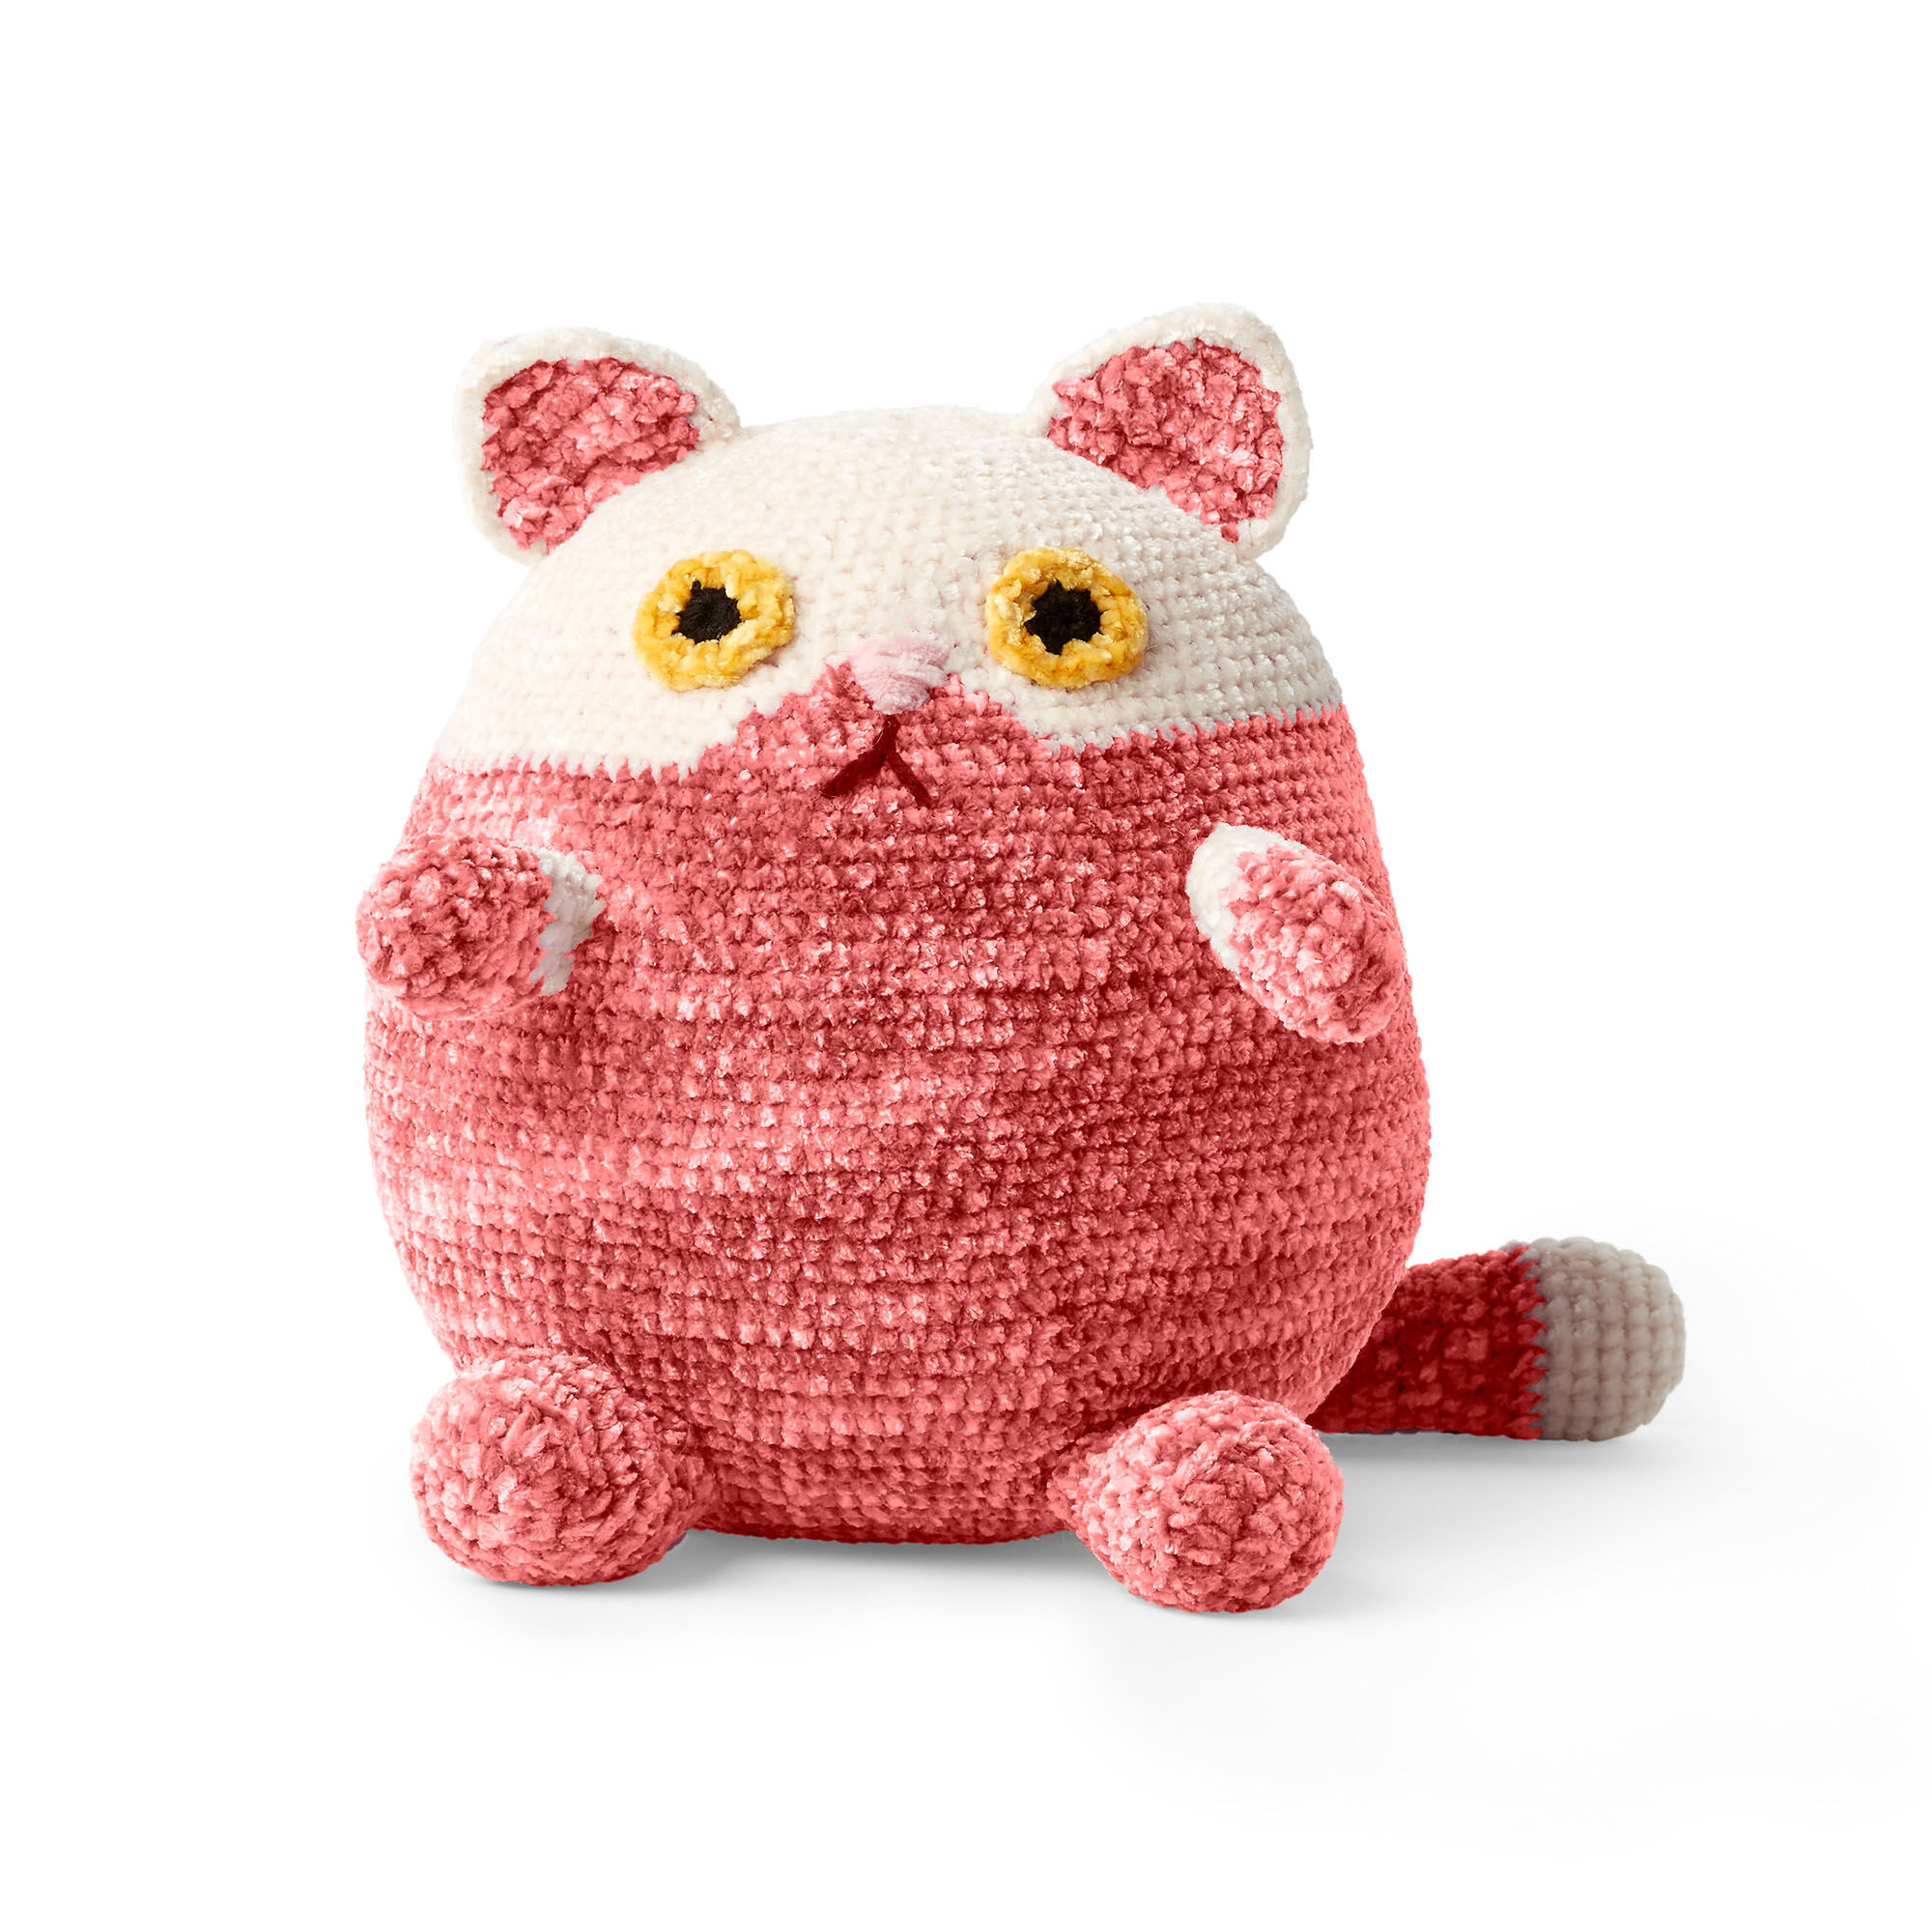 Grumpy Cat Hat for Ed Sheeran | Cat hat pattern, Crochet cat hat ... | 2000x2000